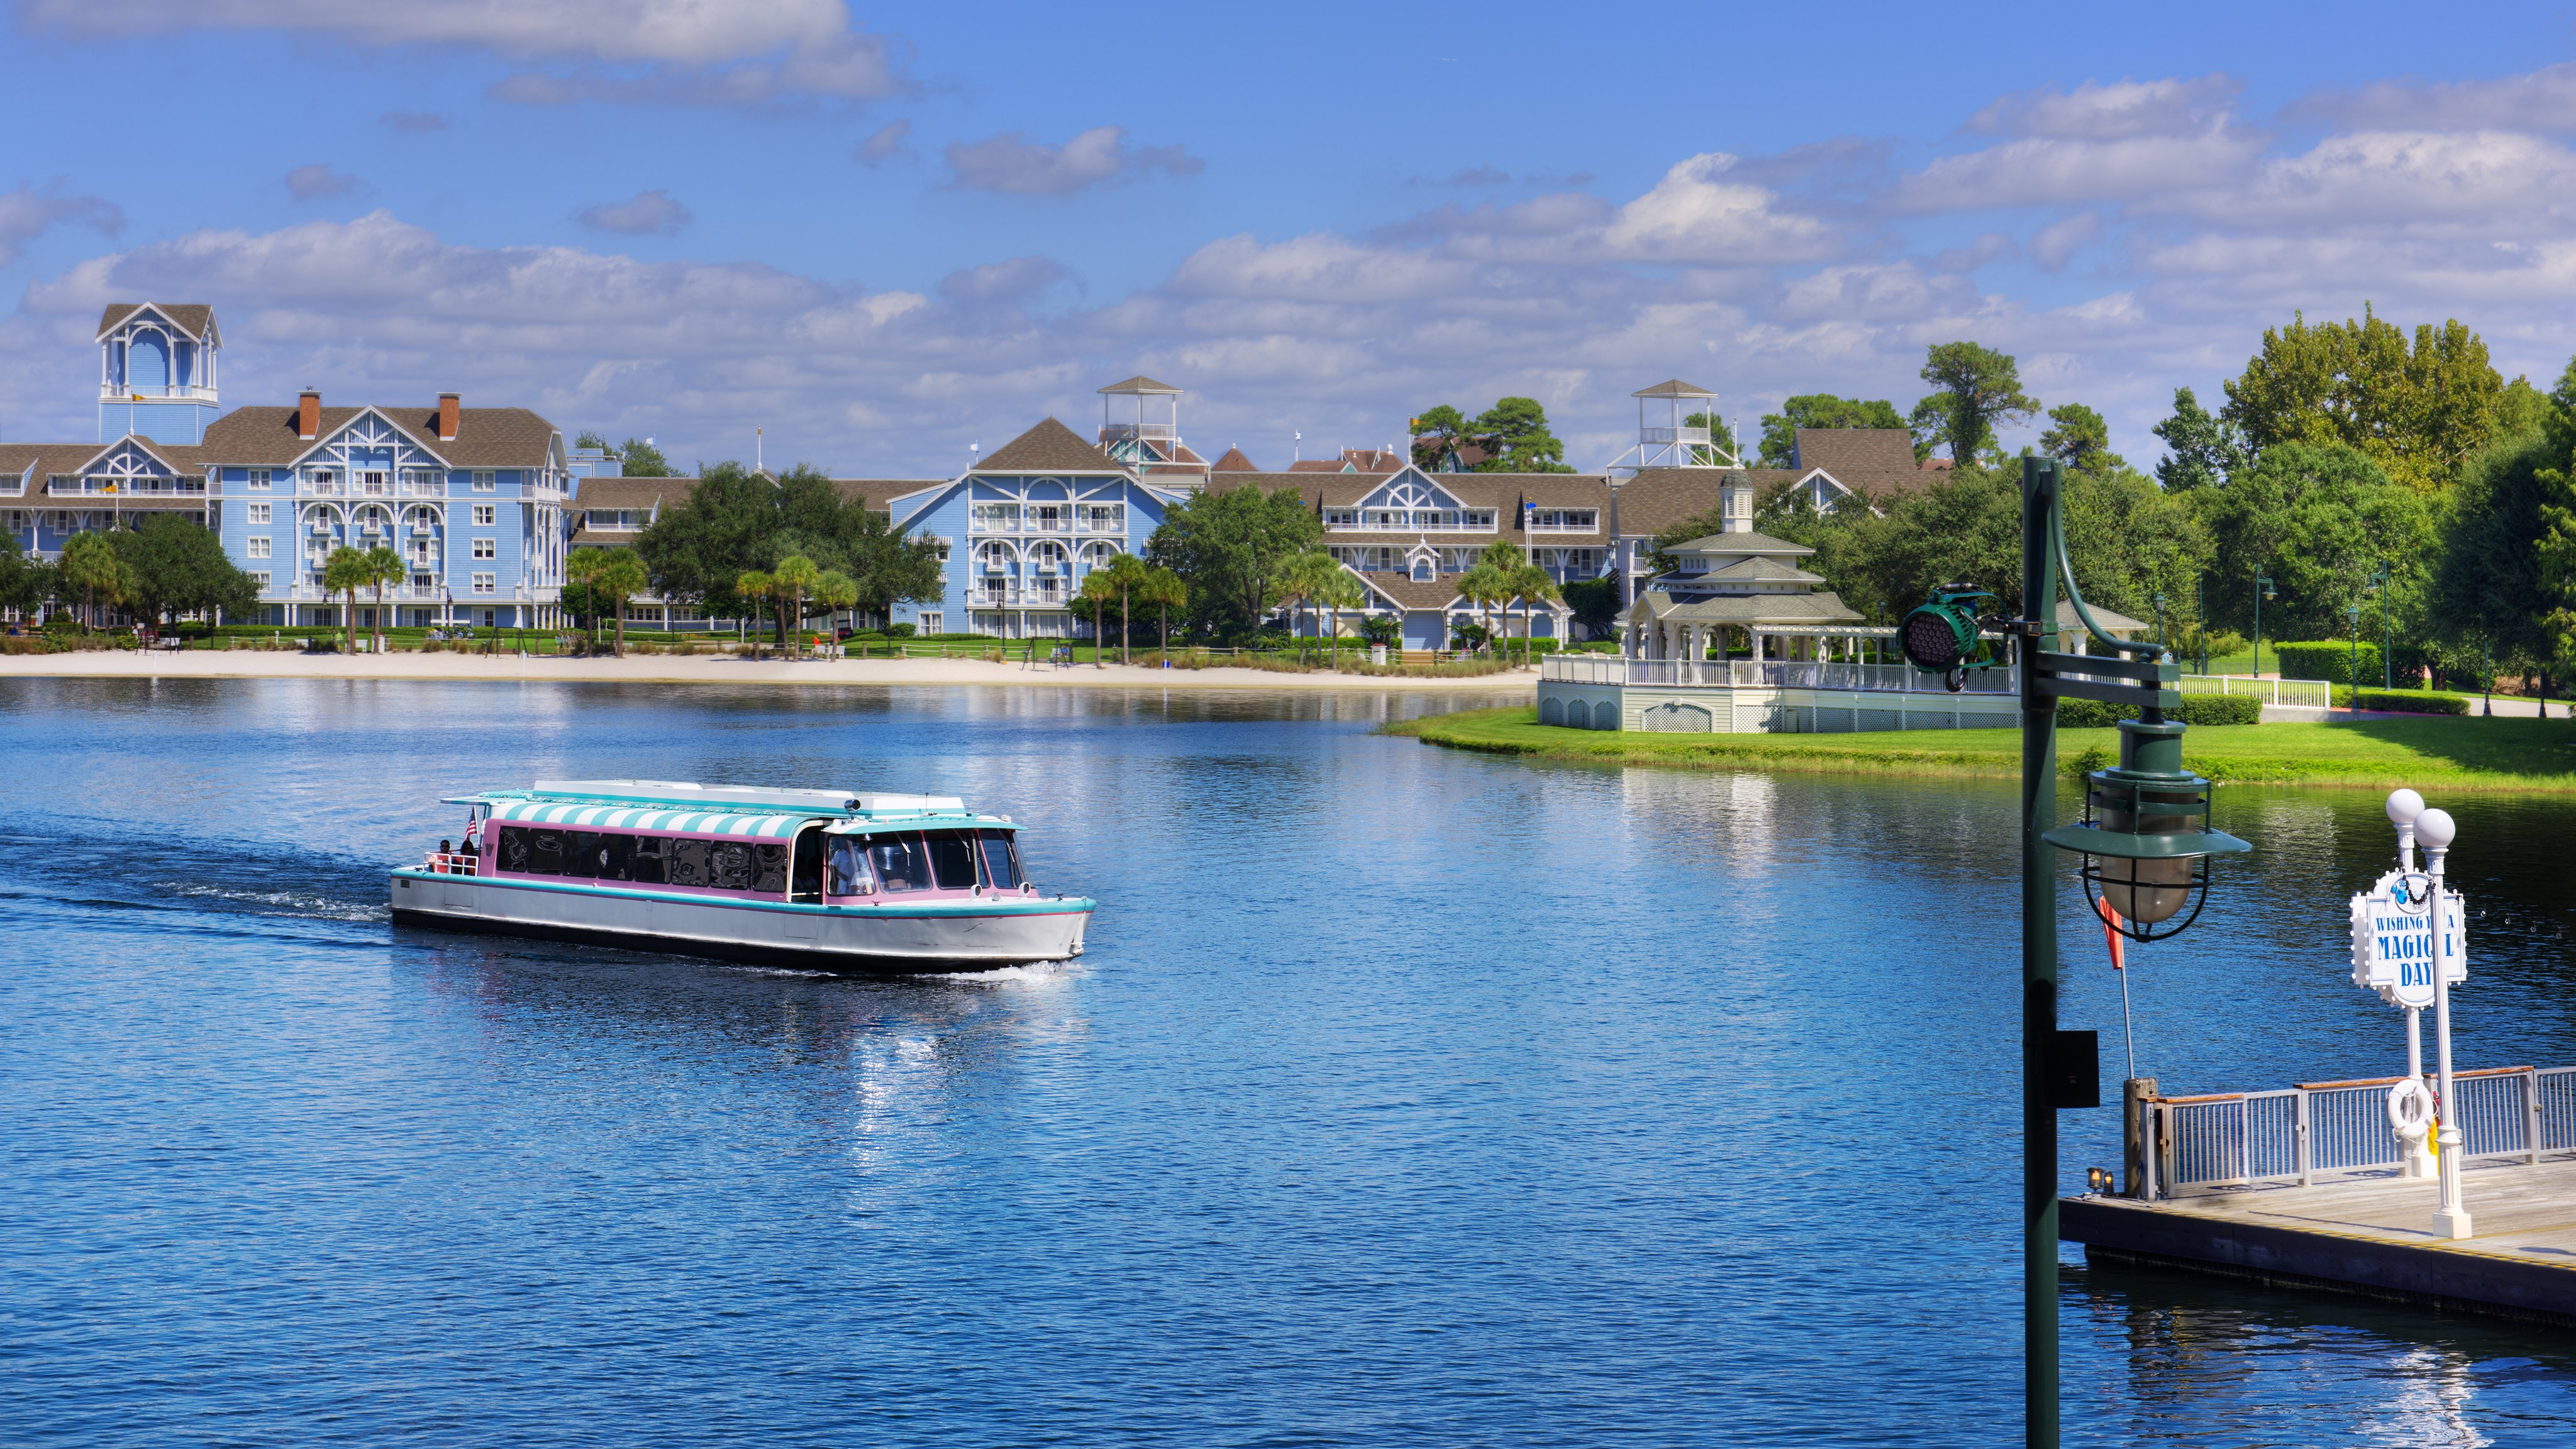 Disney's-Saratoga-springs-resort-and-spa